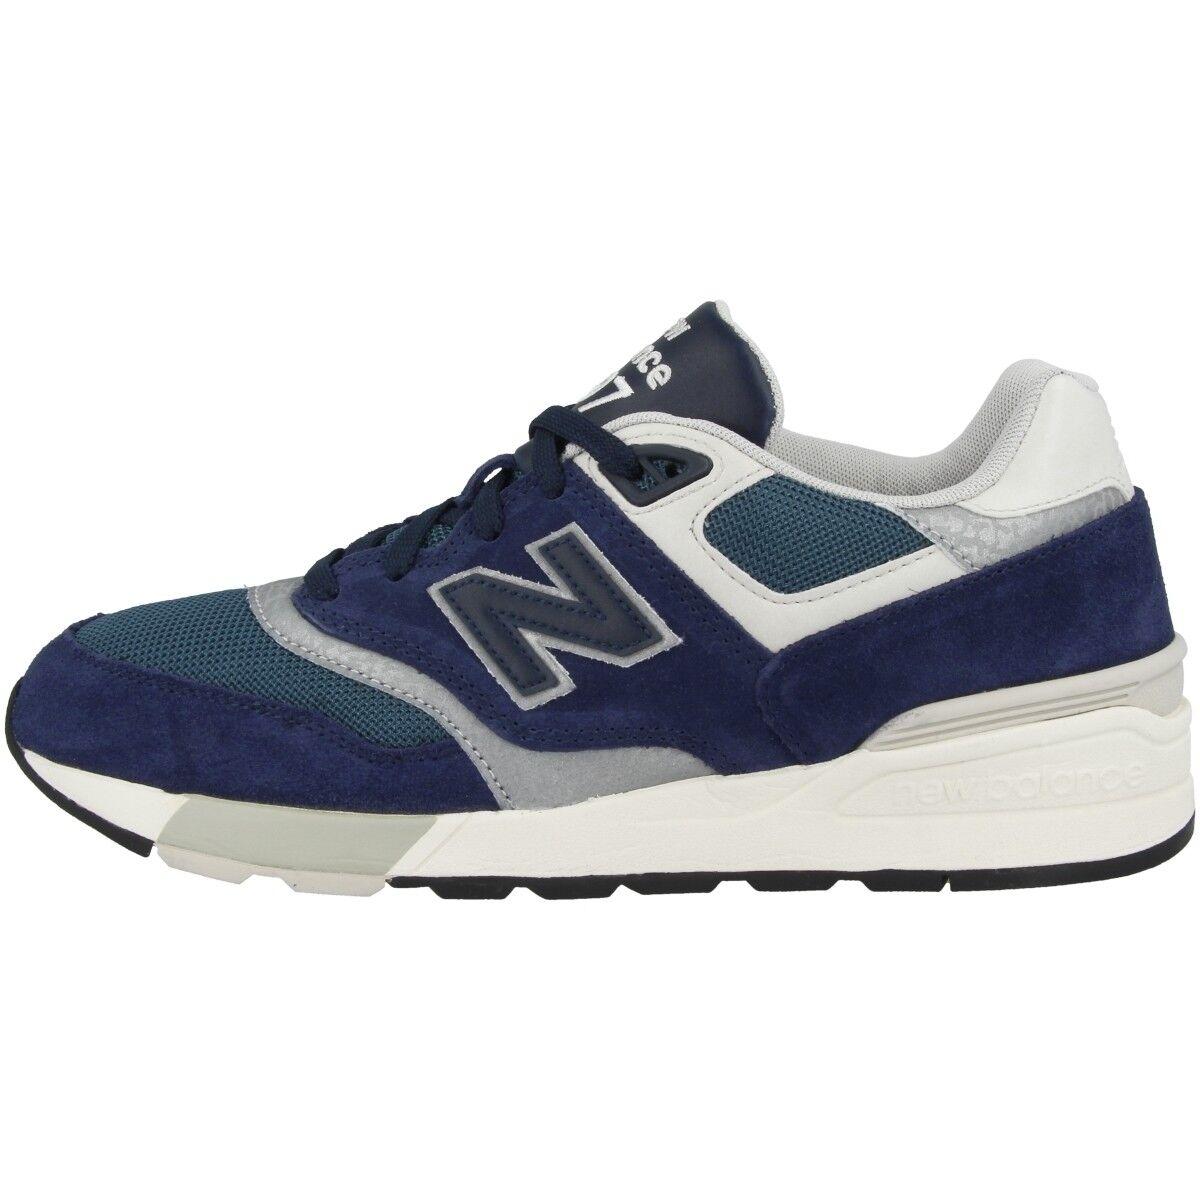 New Balance ML 597 AAA Schuhe Sport Sneaker Blau schwarz orion Grau ML597AAA